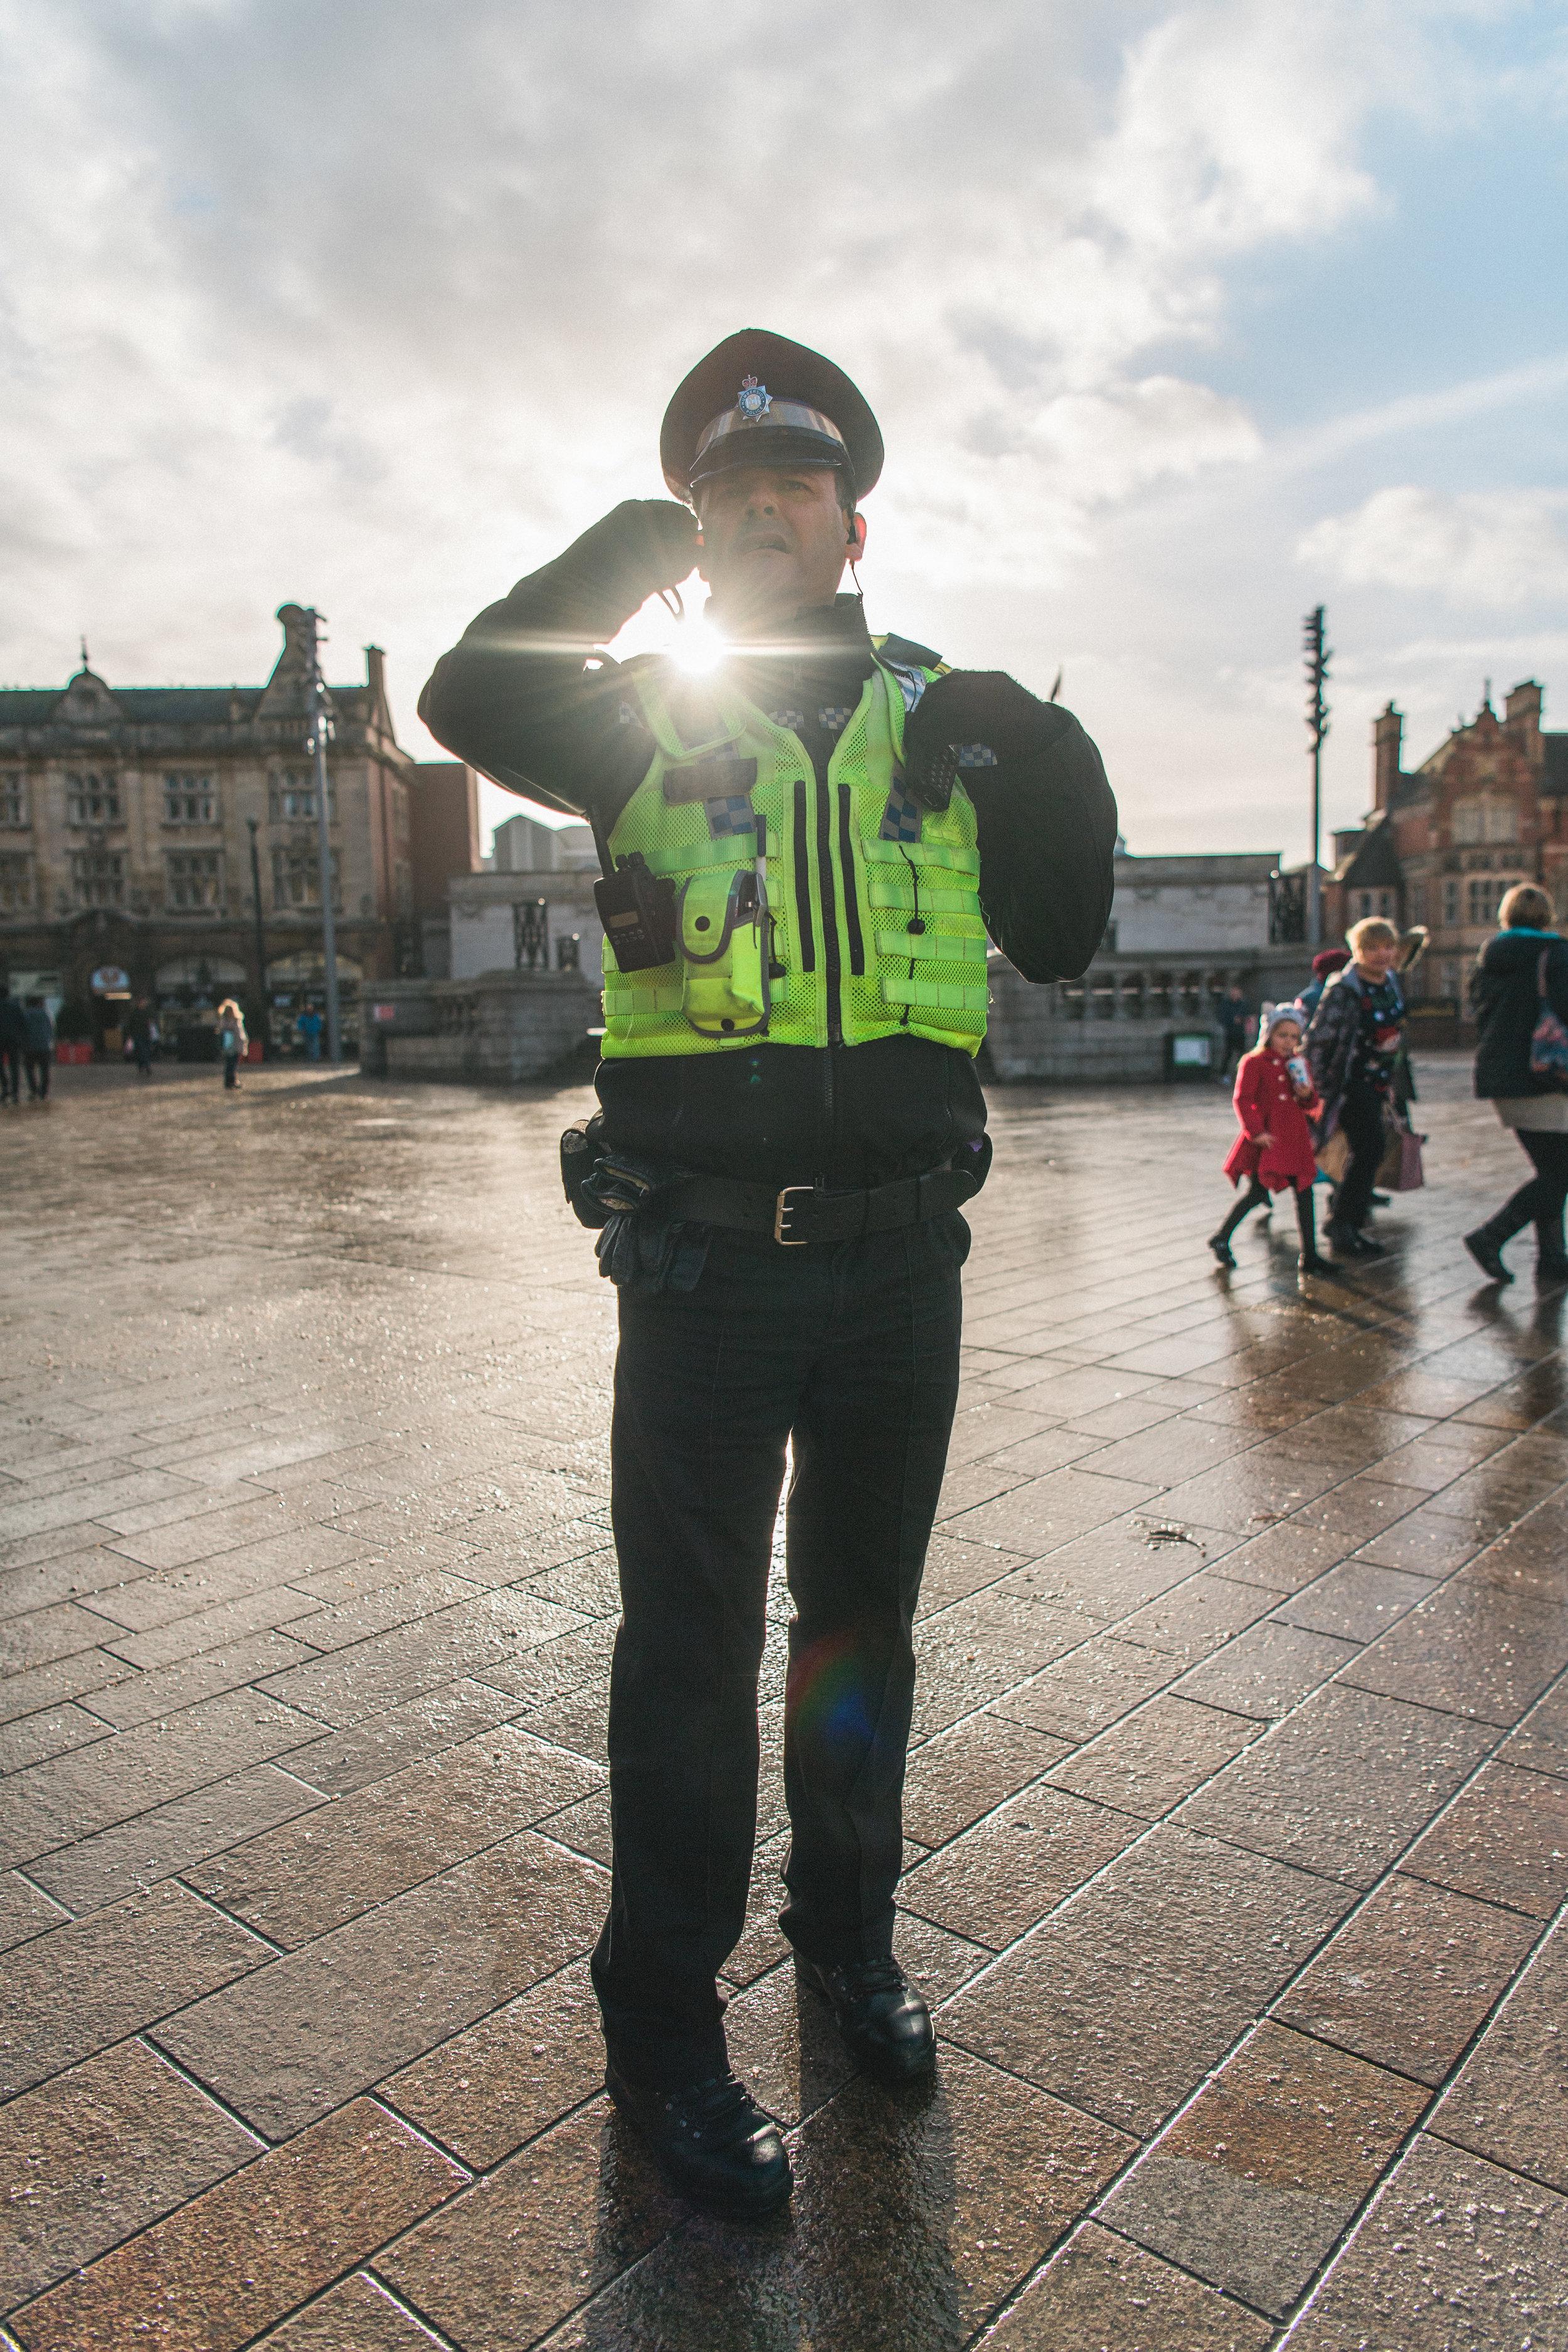 Police Images - www.patrickmateer.com LOW RES00039.jpg